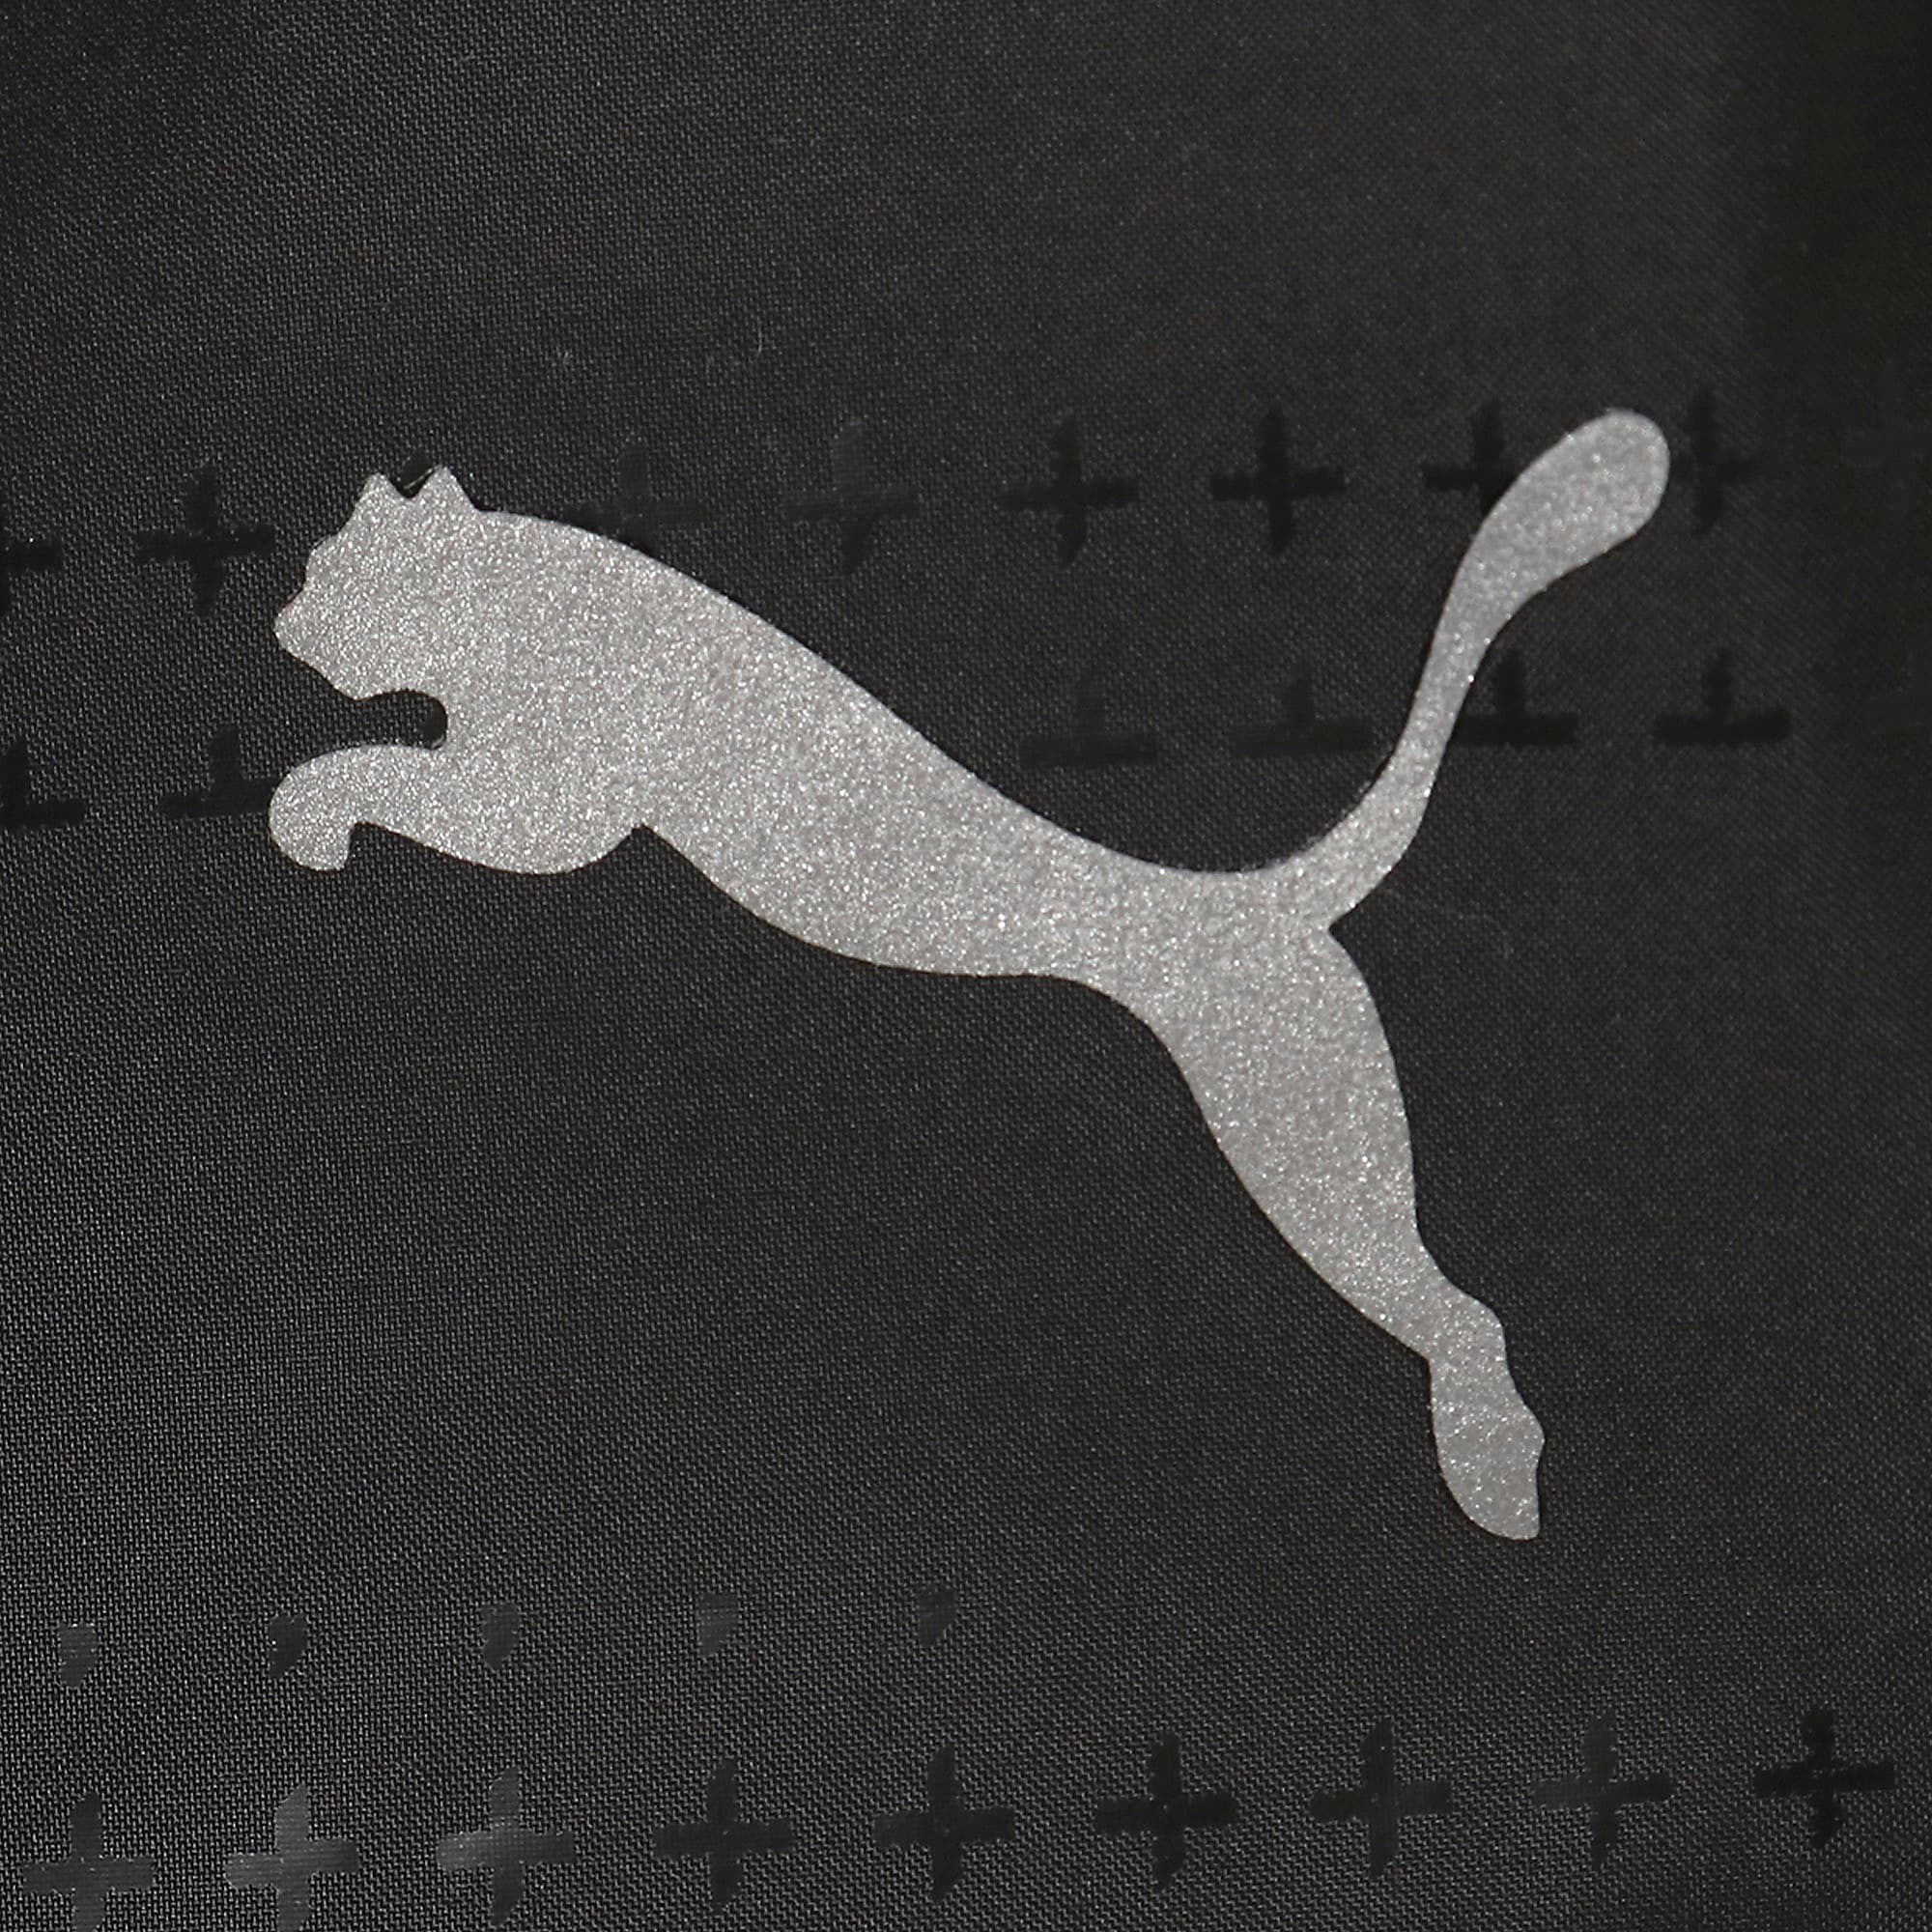 Thumbnail 6 of キープアップ グラフィック ウィメンズ ショーツ 5インチ, Puma Black, medium-JPN